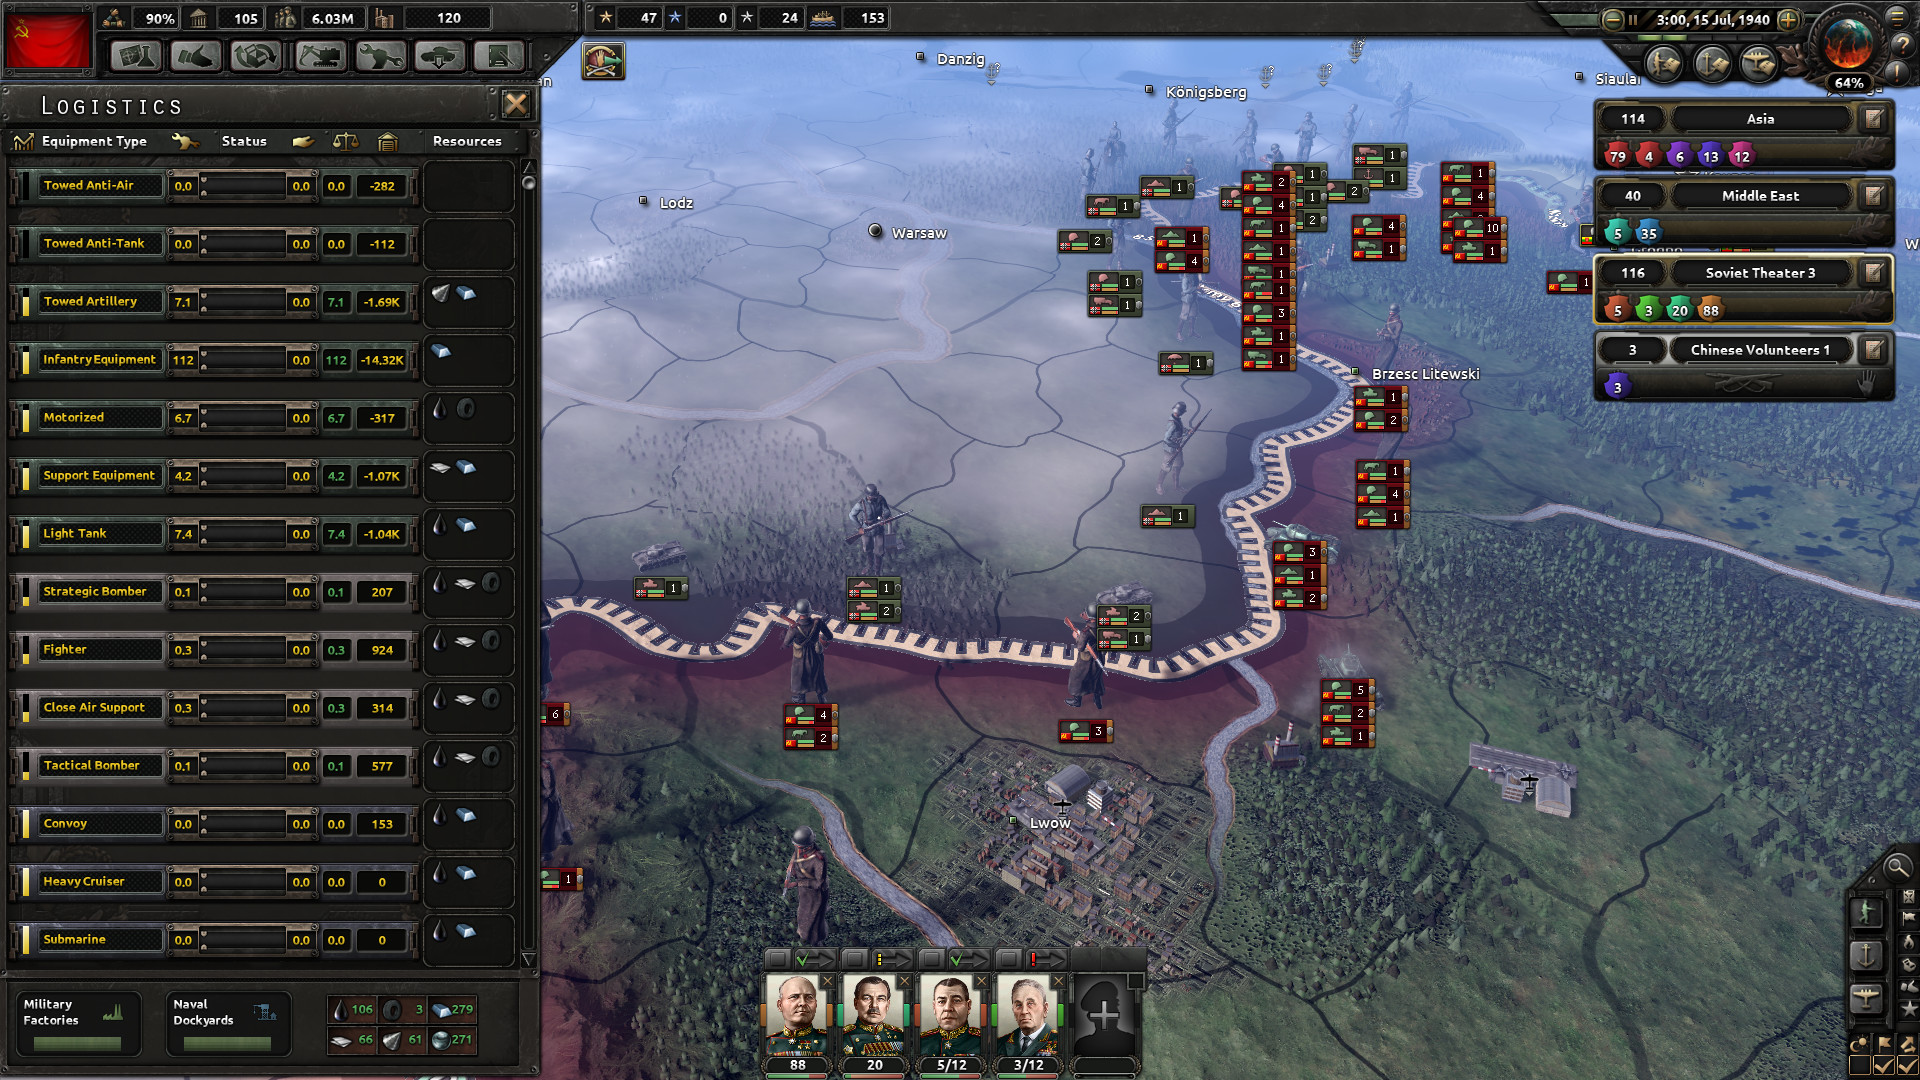 Hearts of Iron IV Screenshot 1